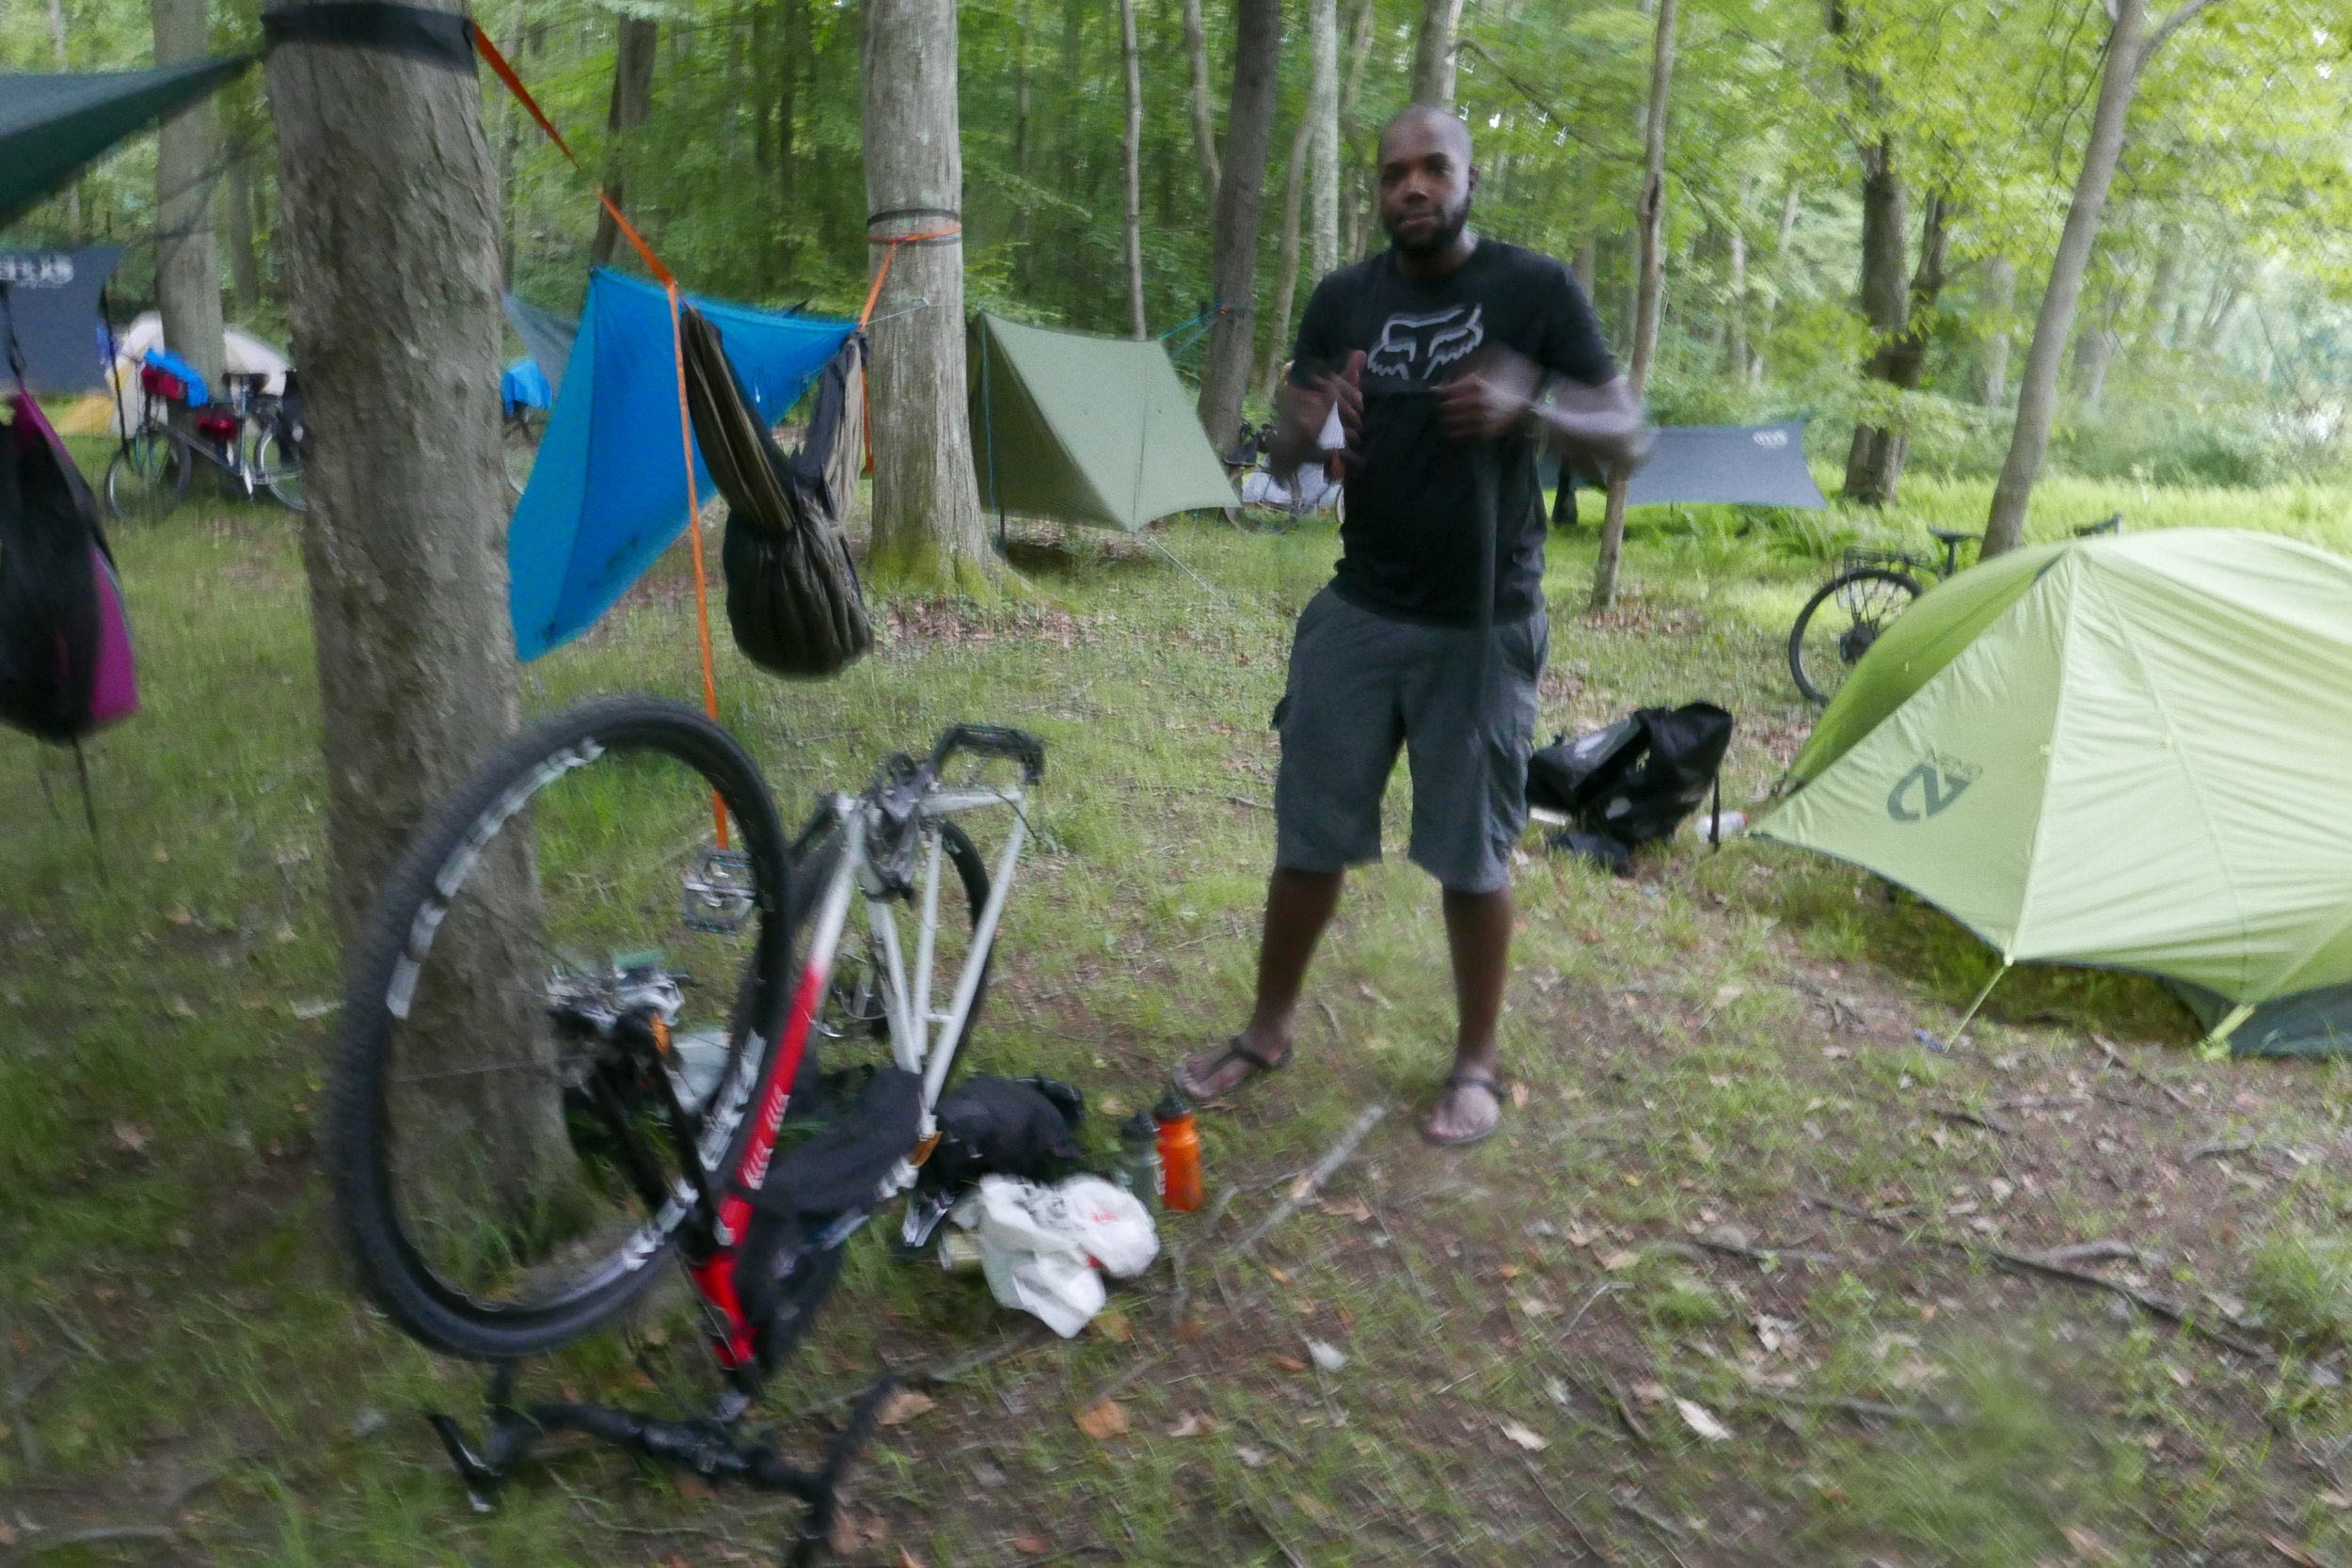 Campsite repairs by Prentiss